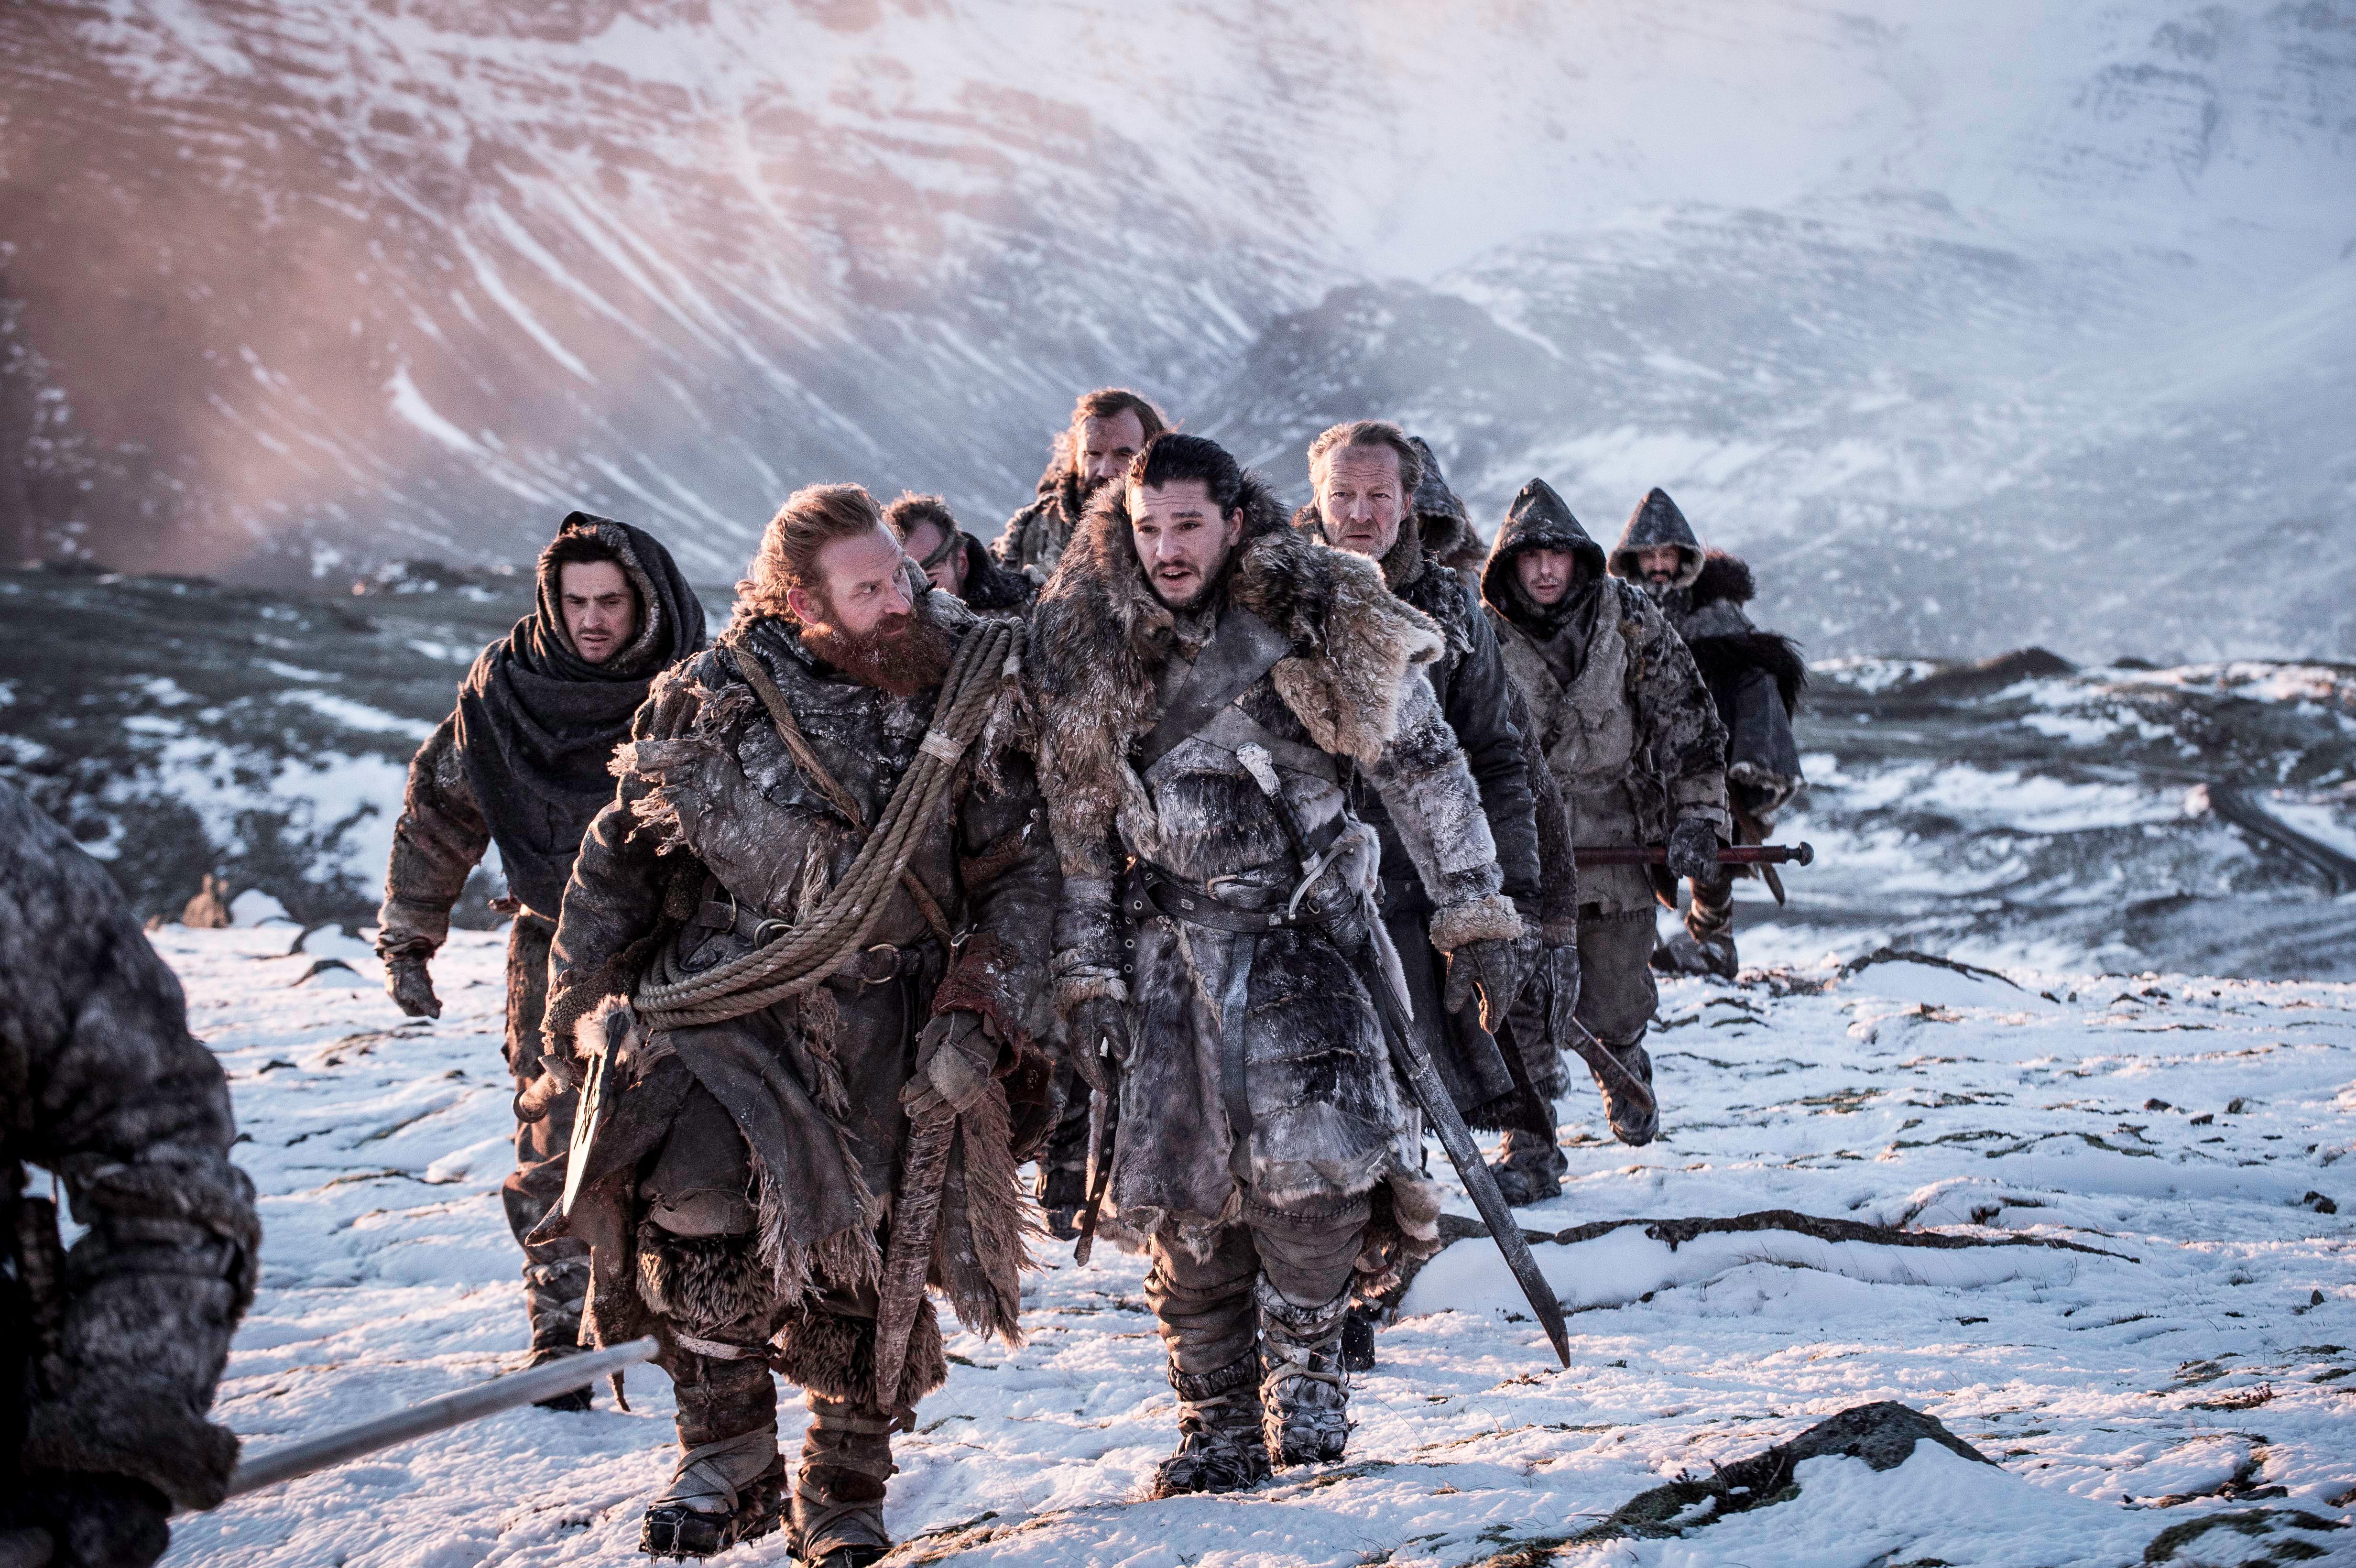 Game Of Thrones Season 7 Ep. 6 Wallpaper, HD Movies 4K